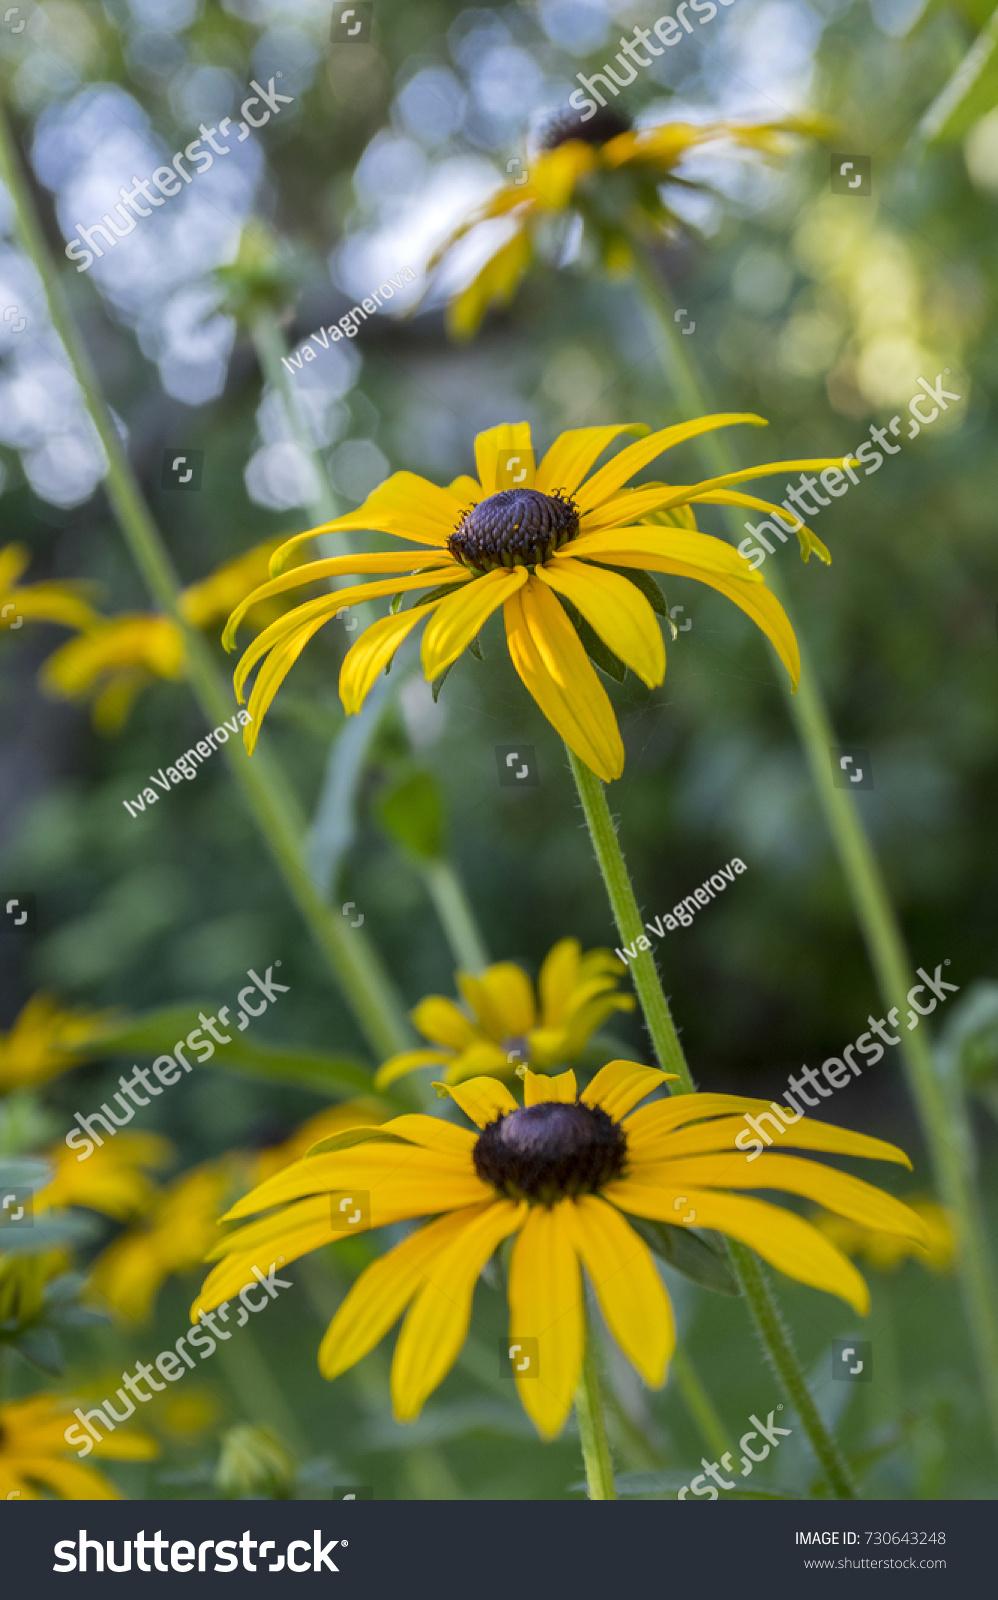 Rudbeckia hirta yellow flower with black brown centre in bloom rudbeckia hirta yellow flower with black brown centre in bloom black eyed susan in the garden ez canvas mightylinksfo